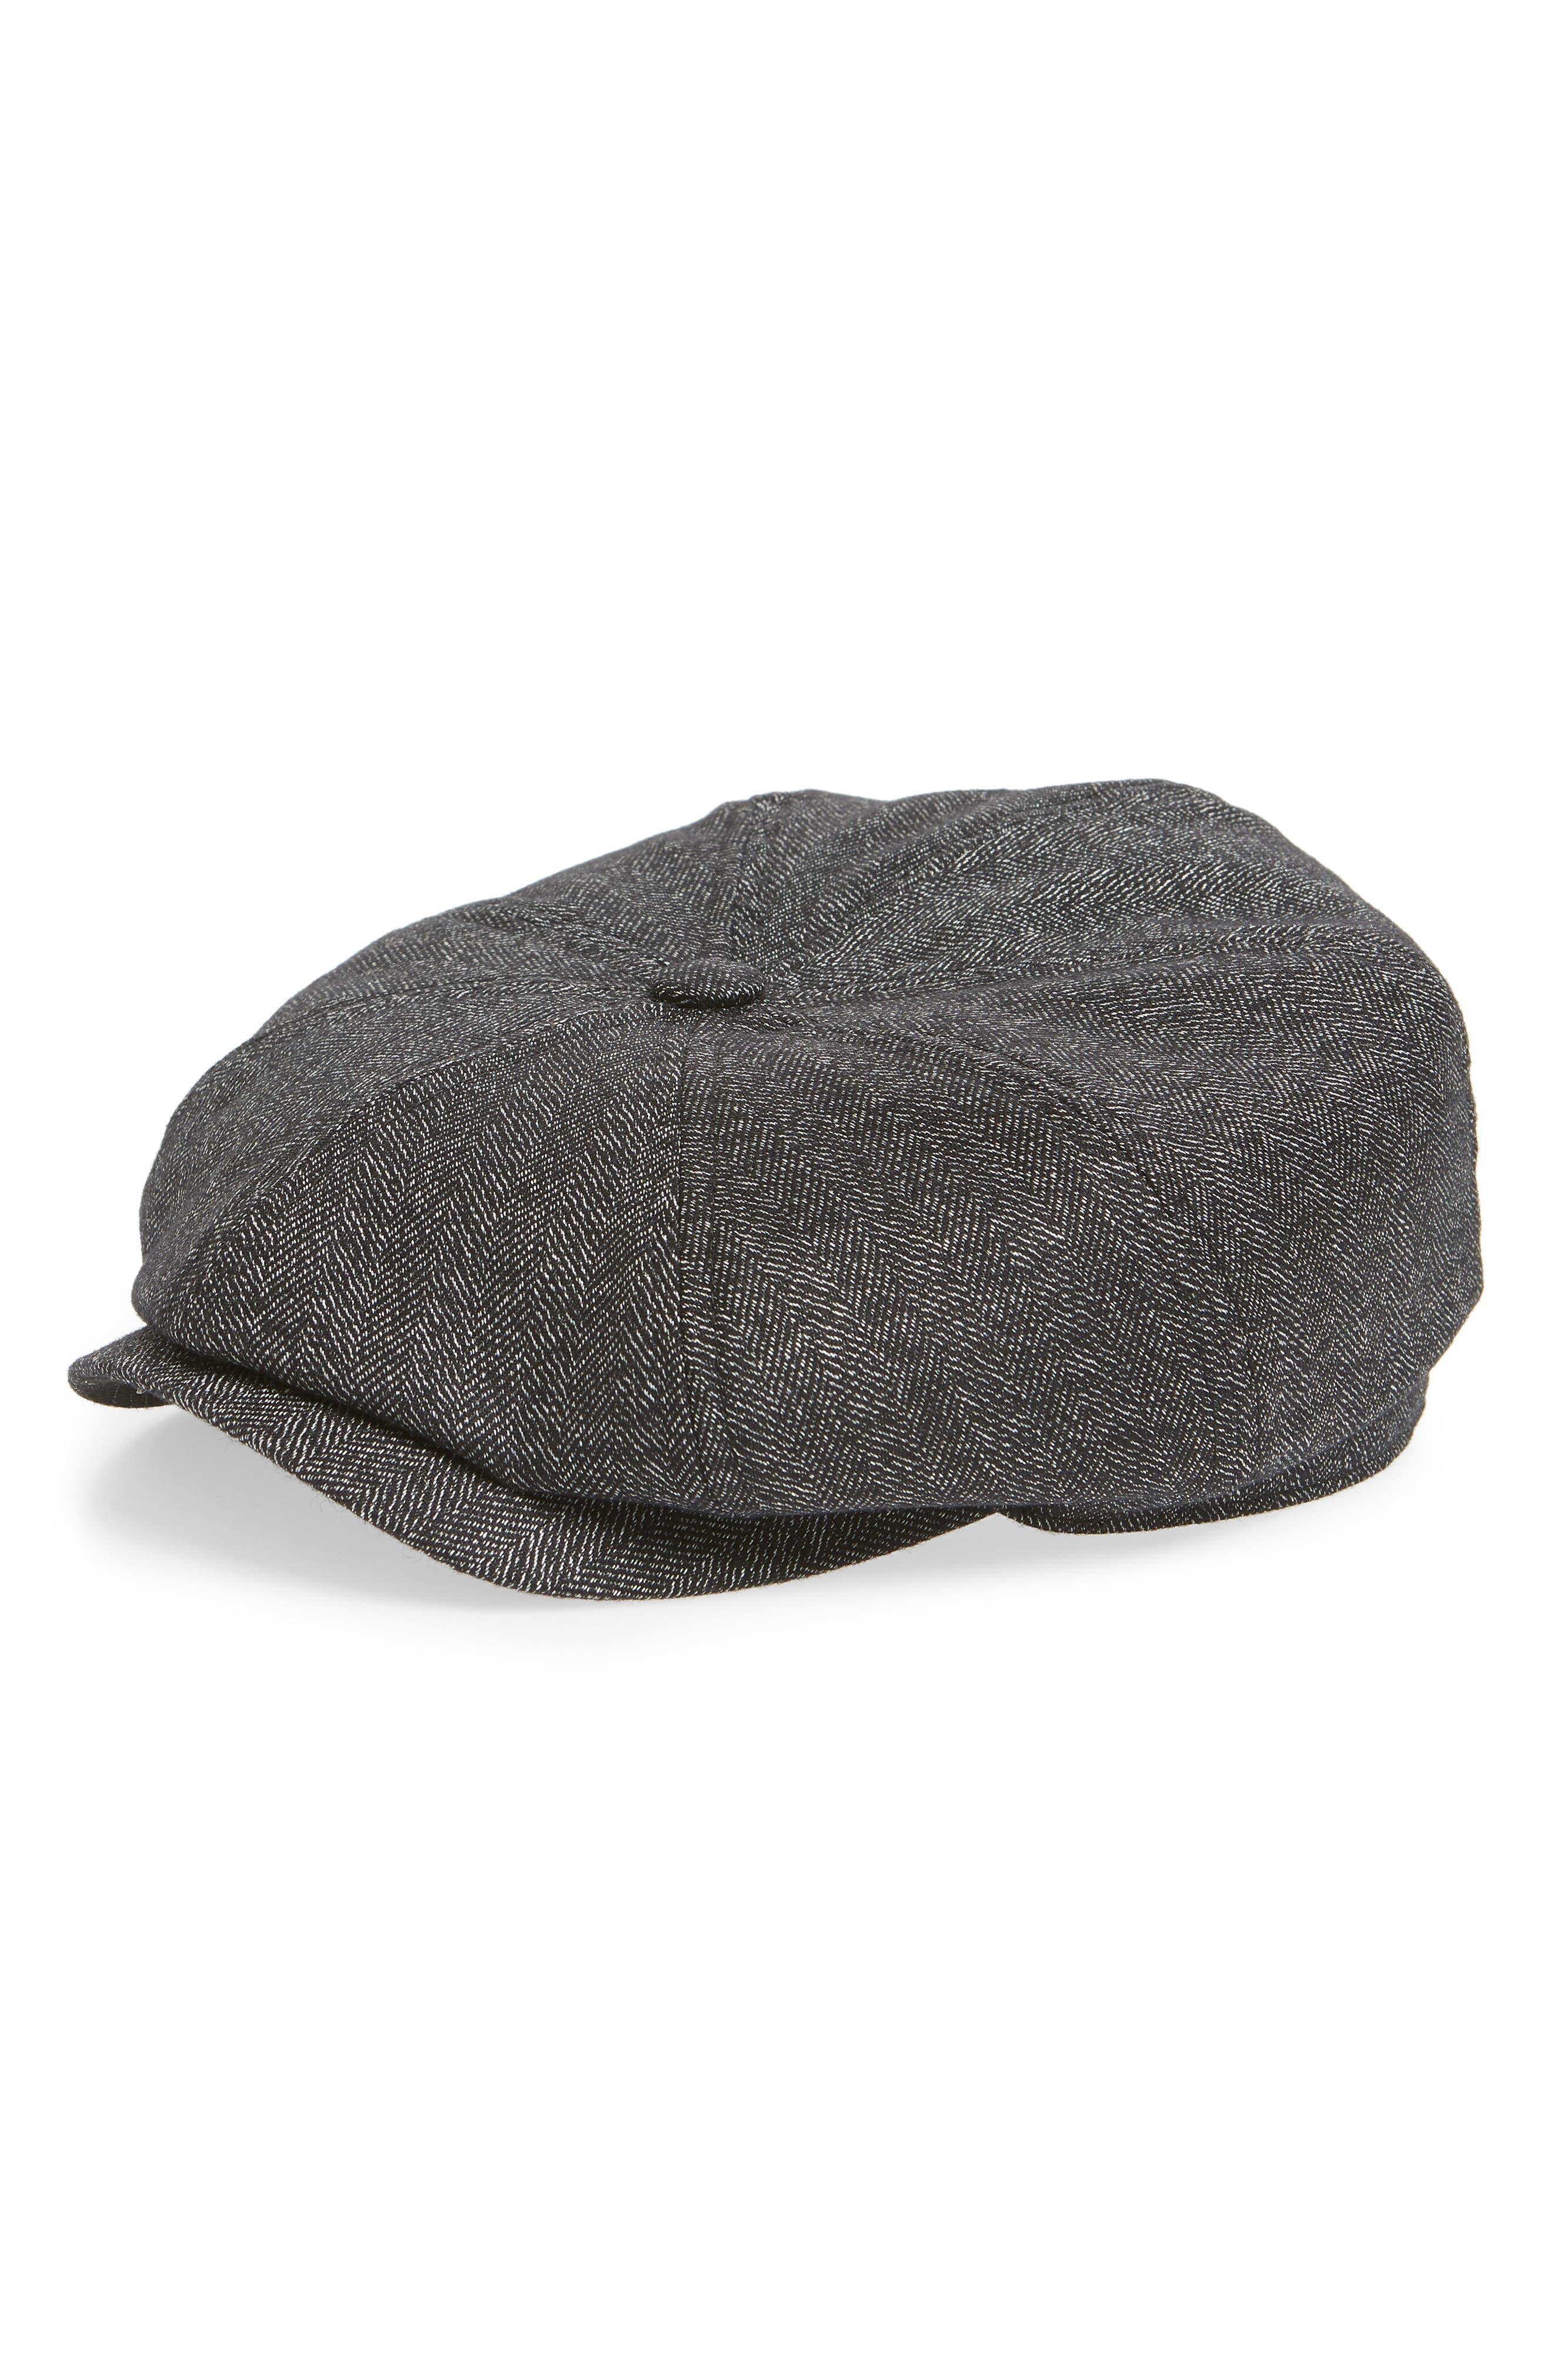 Herringbone Baker Boy Hat,                         Main,                         color, 020